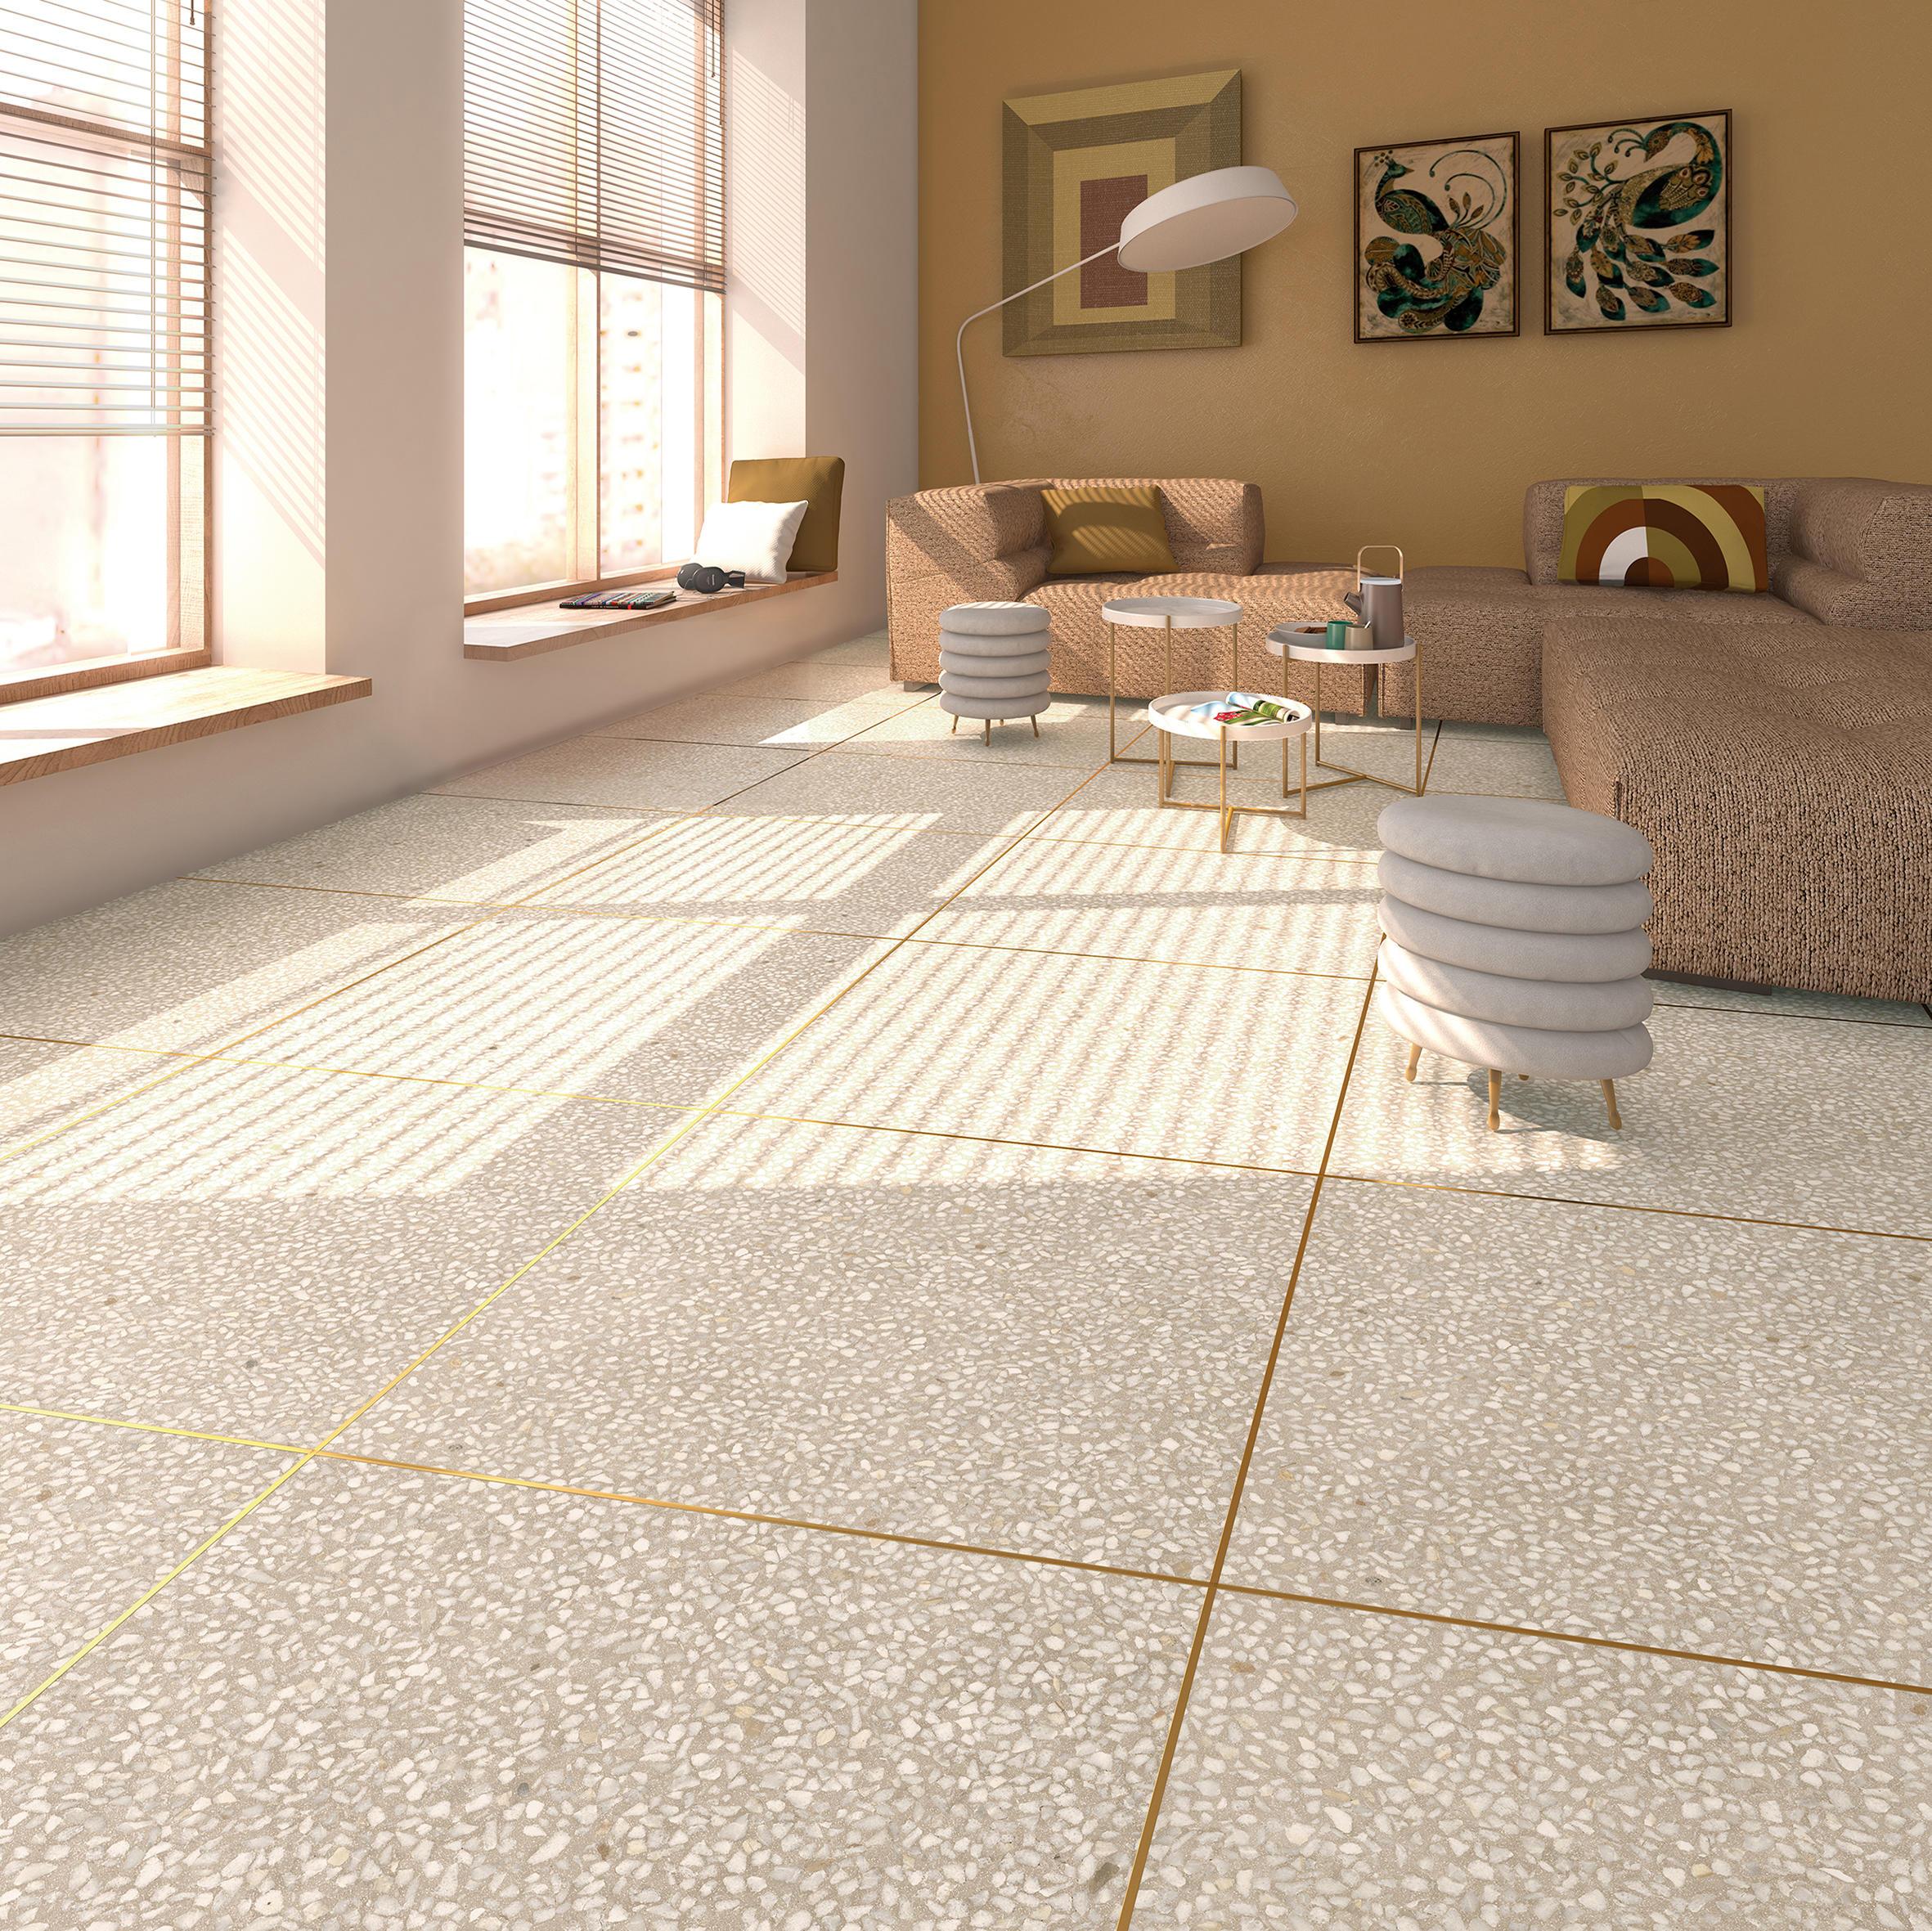 astonis peinture carrelage sol salle de bain carrelage. Black Bedroom Furniture Sets. Home Design Ideas